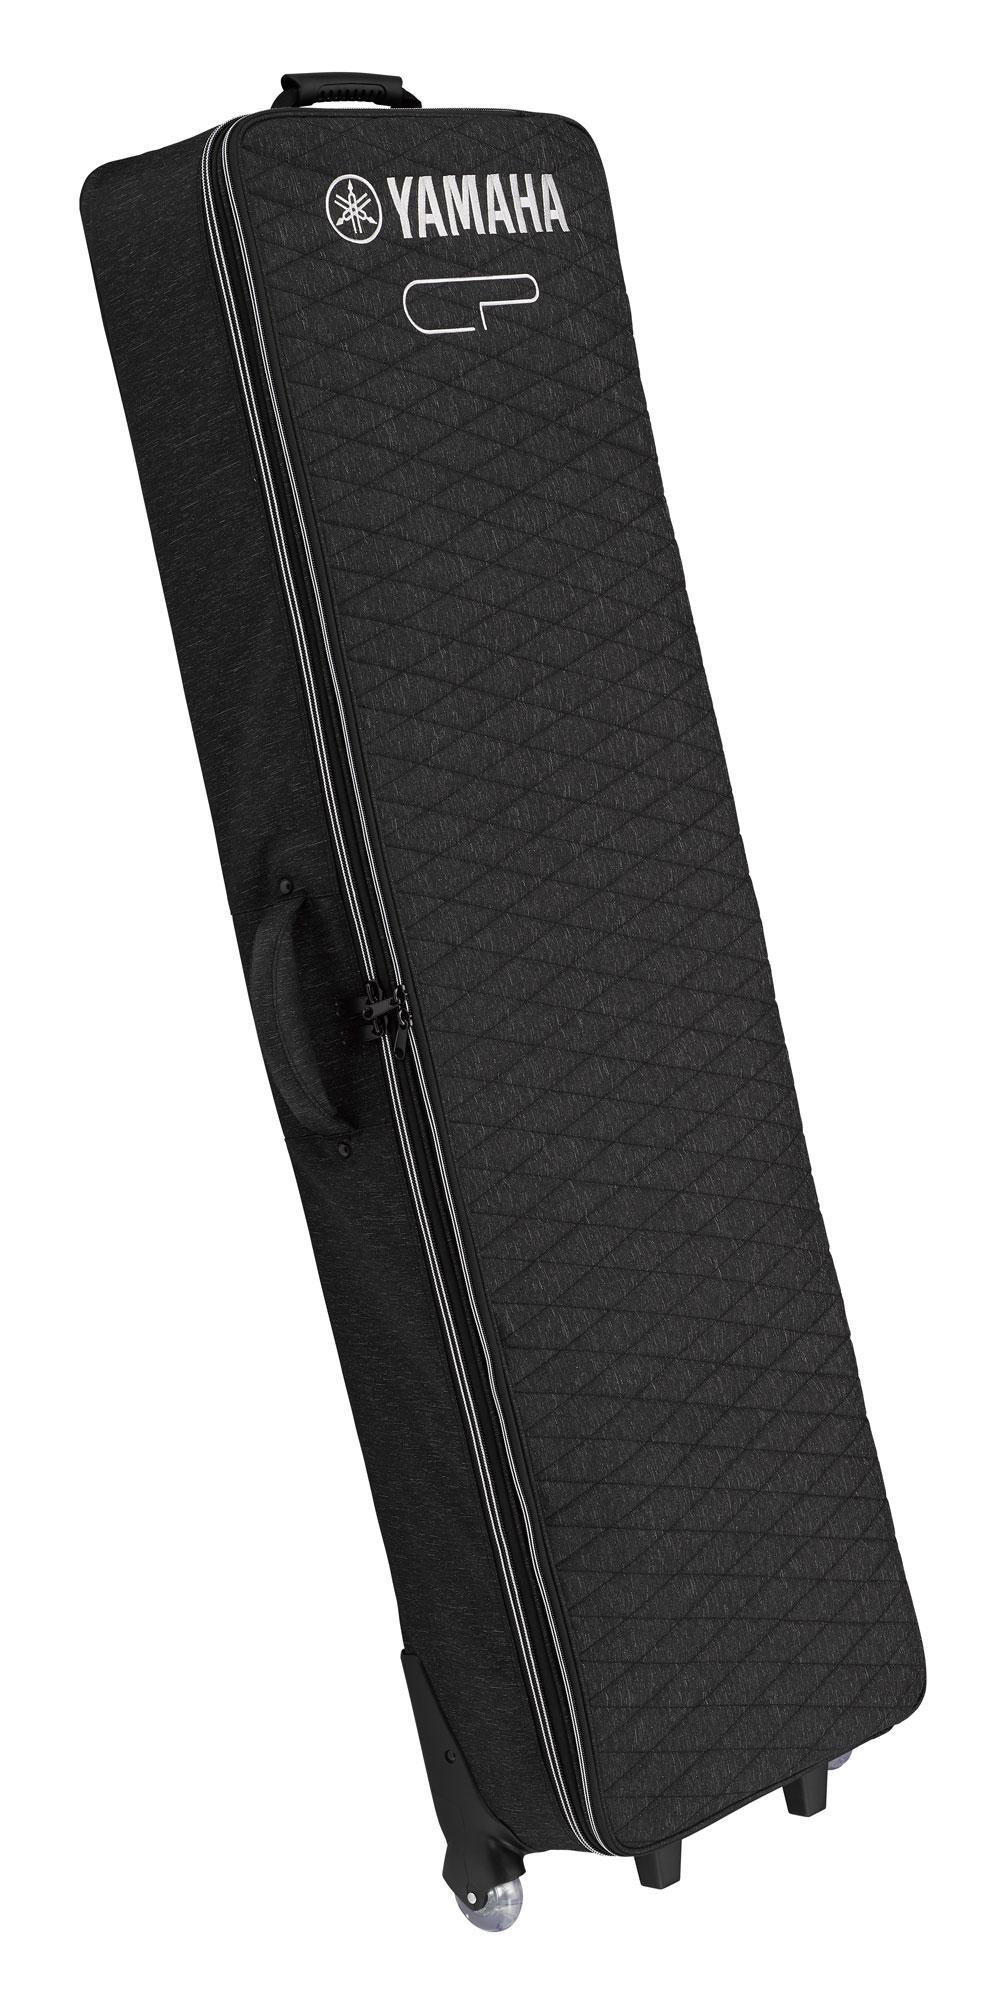 Zubehoerkeyboards - Yamaha SC CP88 Soft Bag - Onlineshop Musikhaus Kirstein